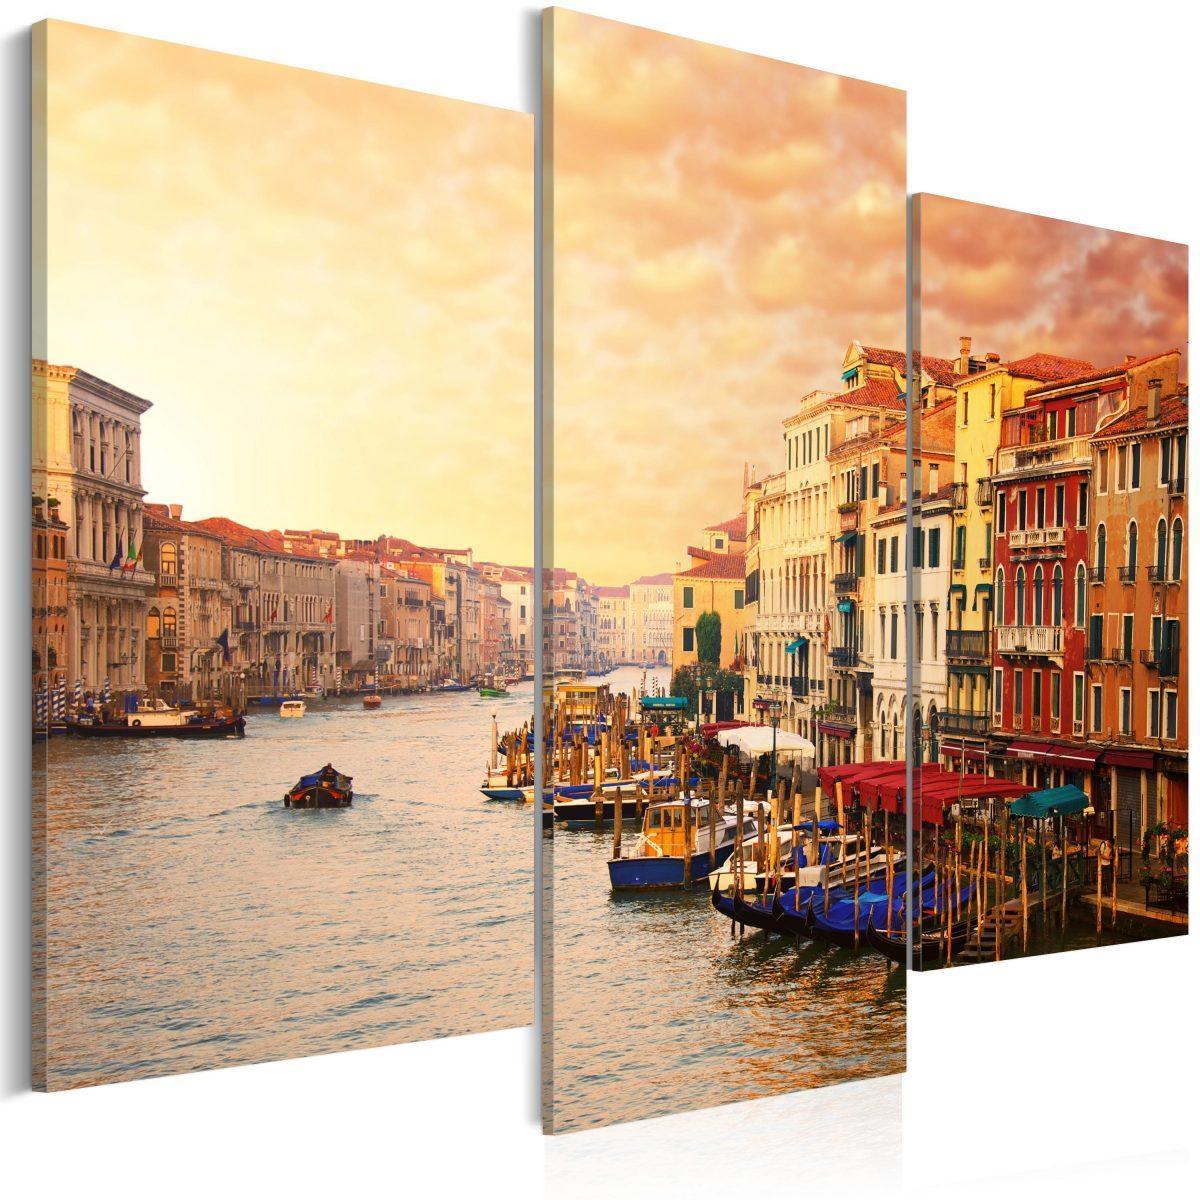 Canvas Tavla - The beauty of Venice - 120x100